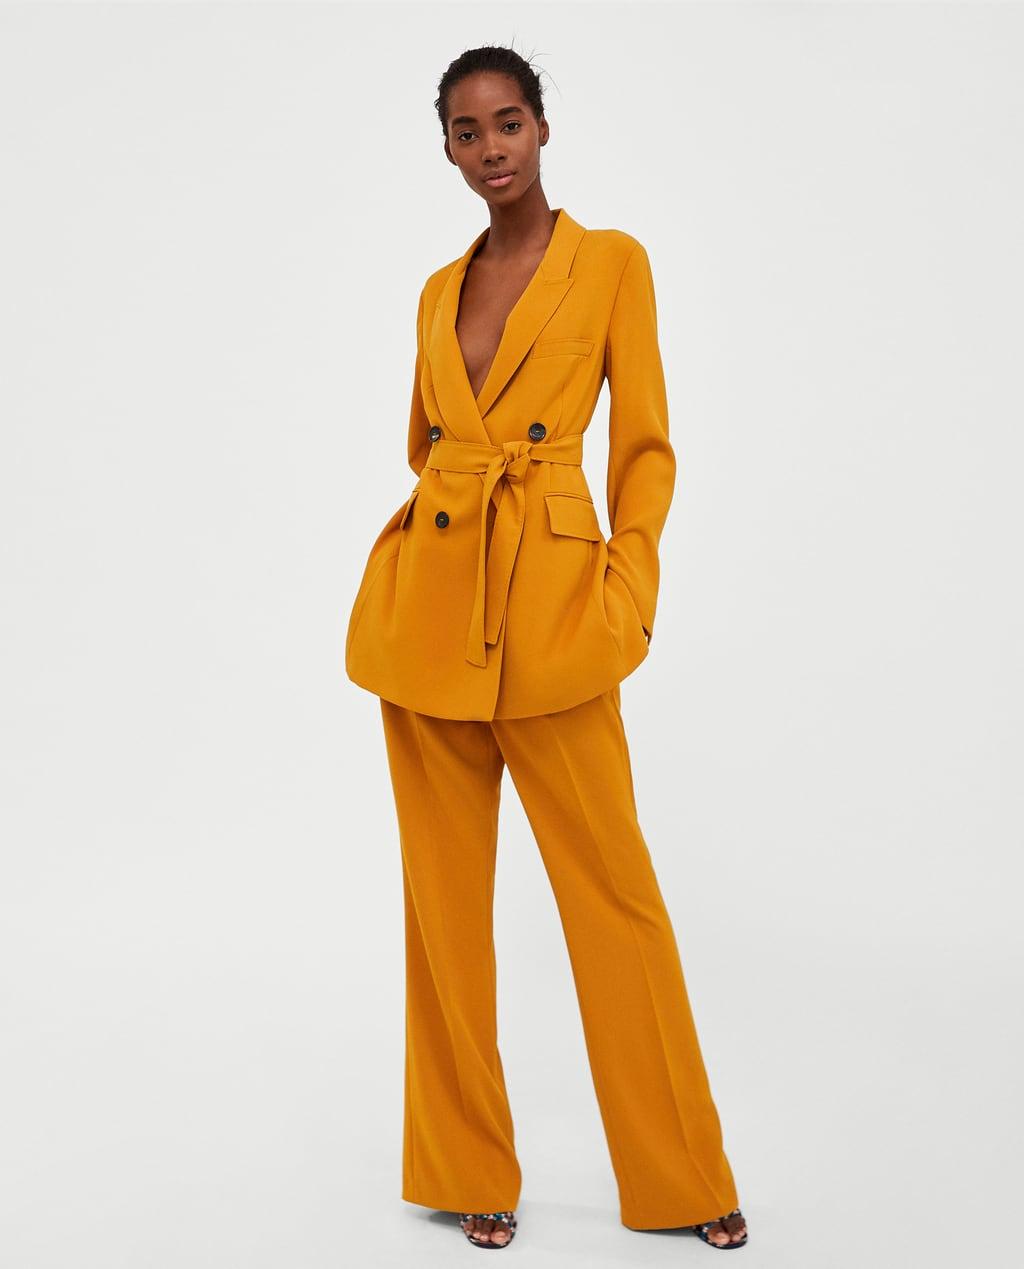 Zara Long Blazer with Belt.jpg